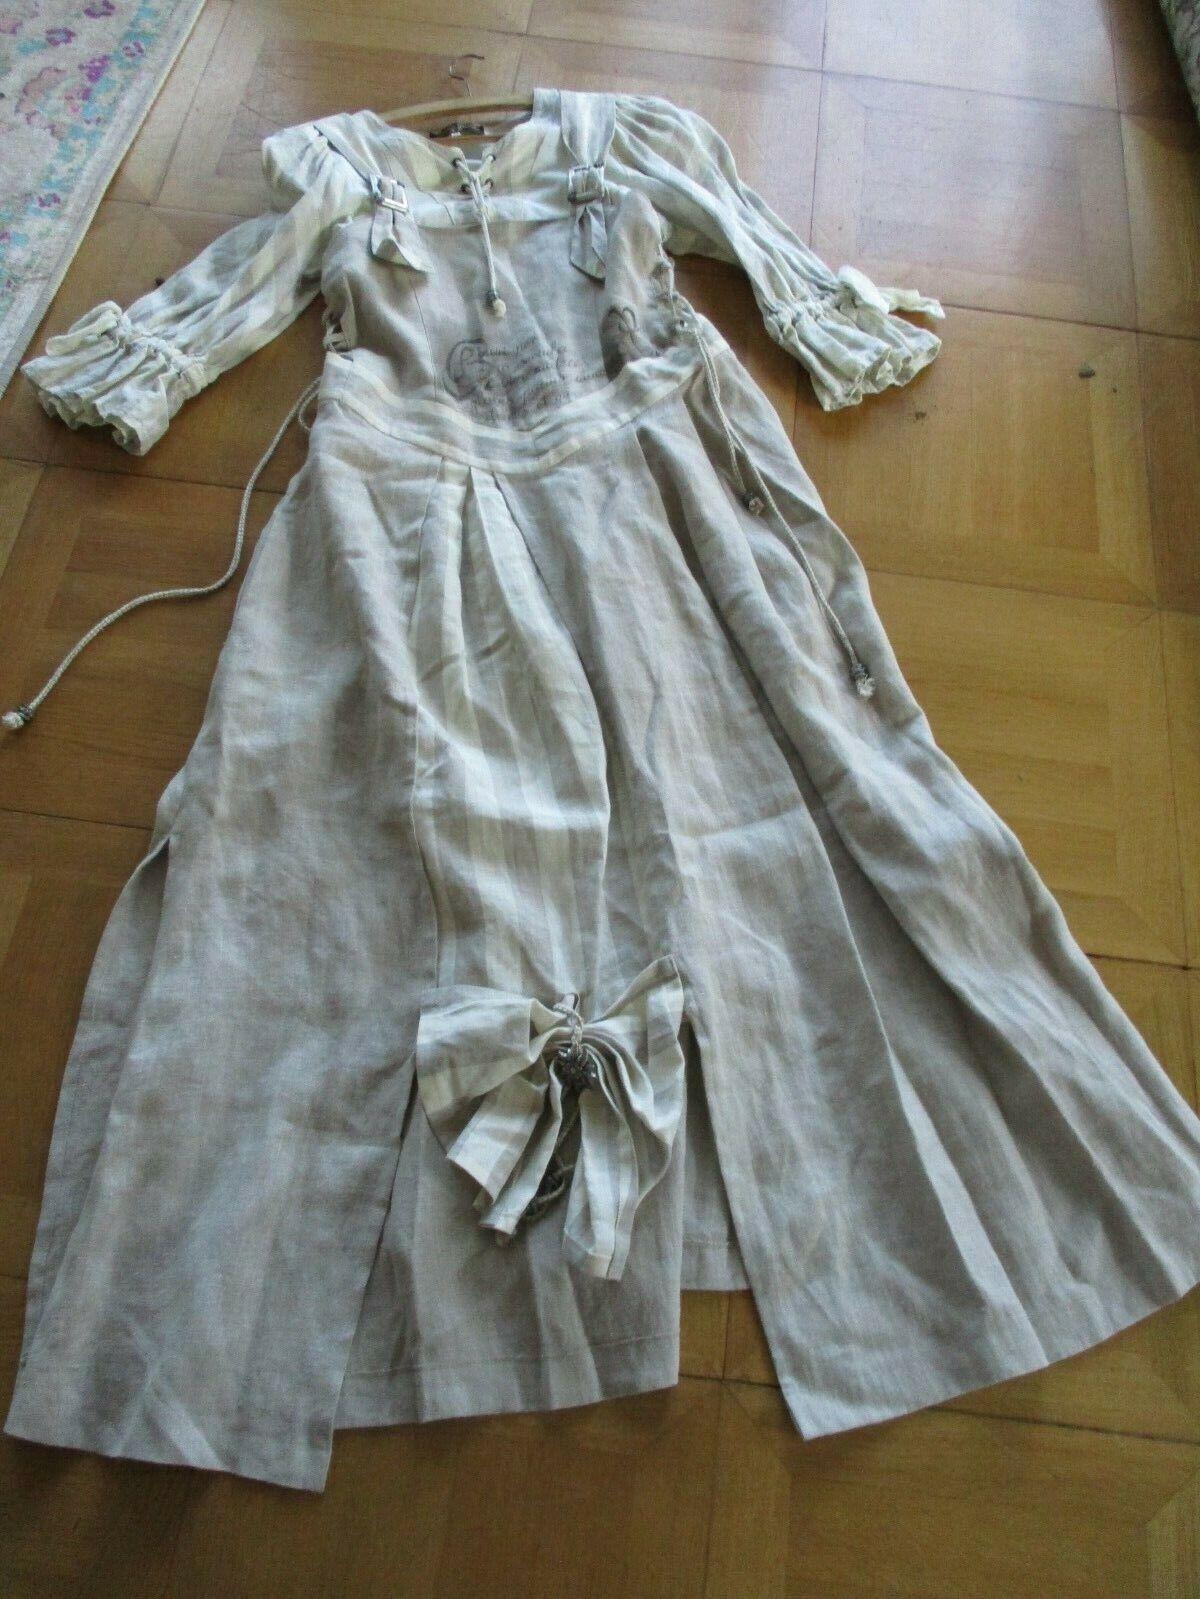 Edel Designer Trachten vestido  largo leinendopino Design s-m única  marca de lujo